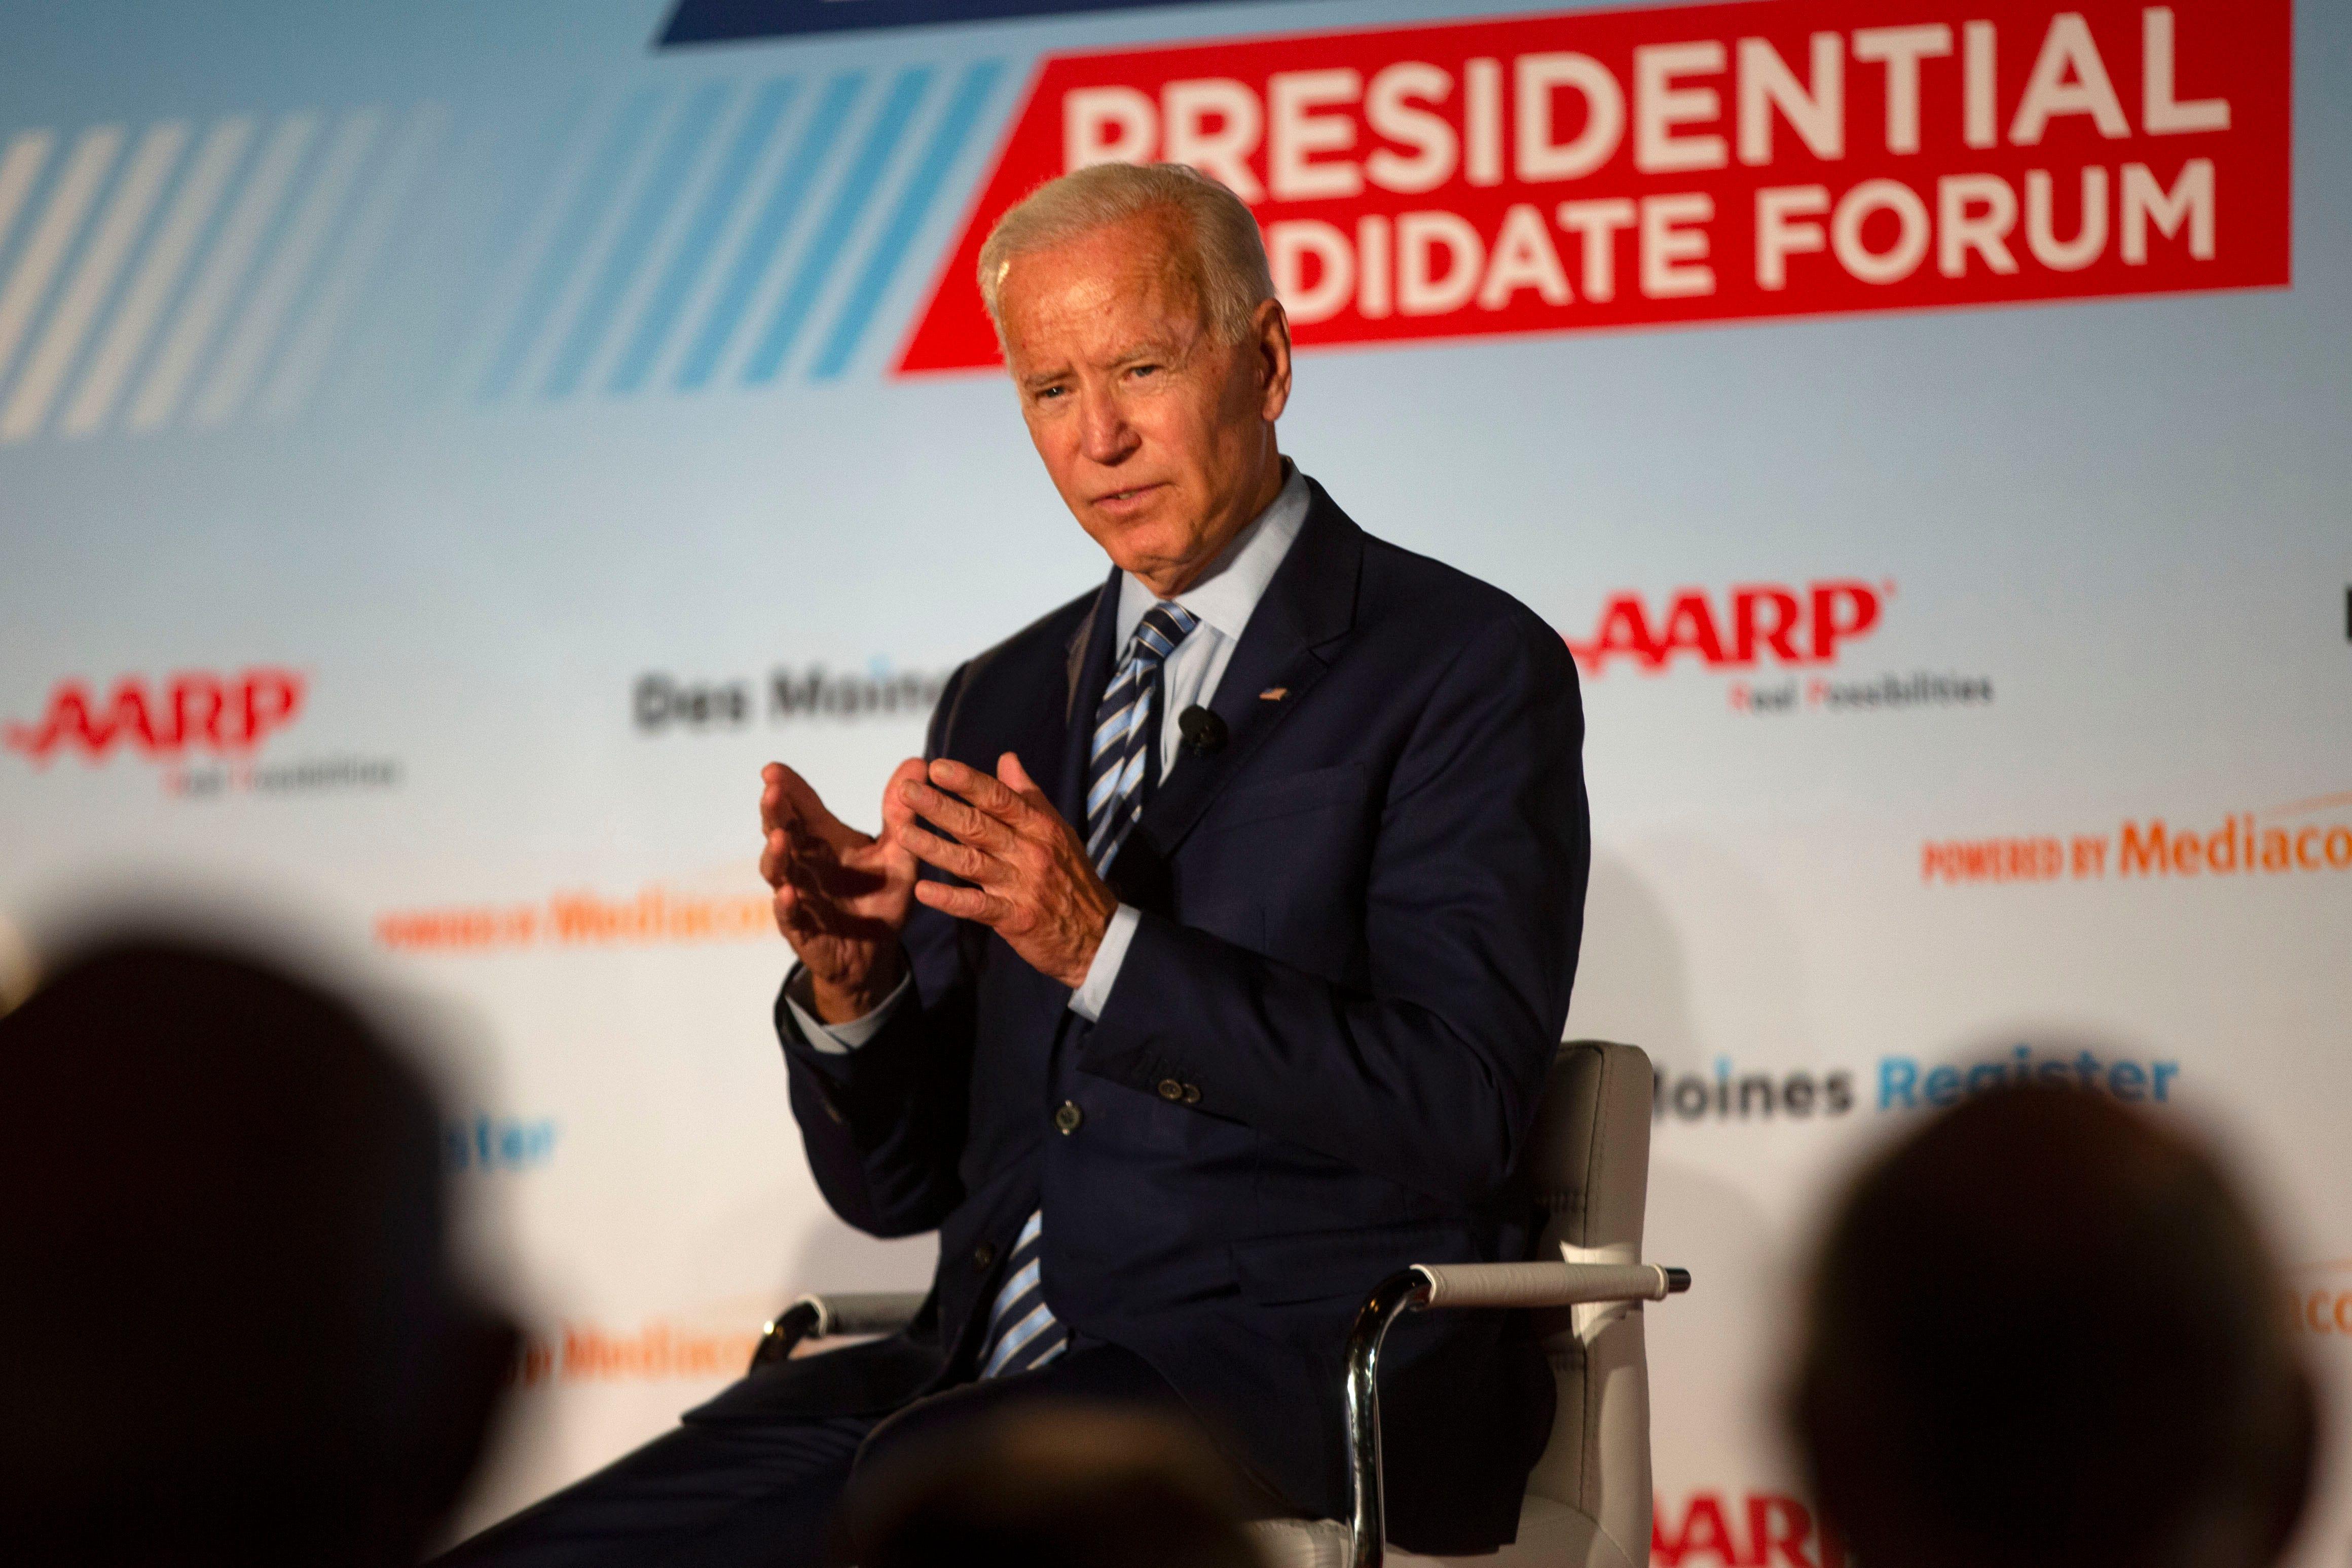 Joe Biden remarks on gene sequencing, leans on moderator Kay Henderson at AARP Forum